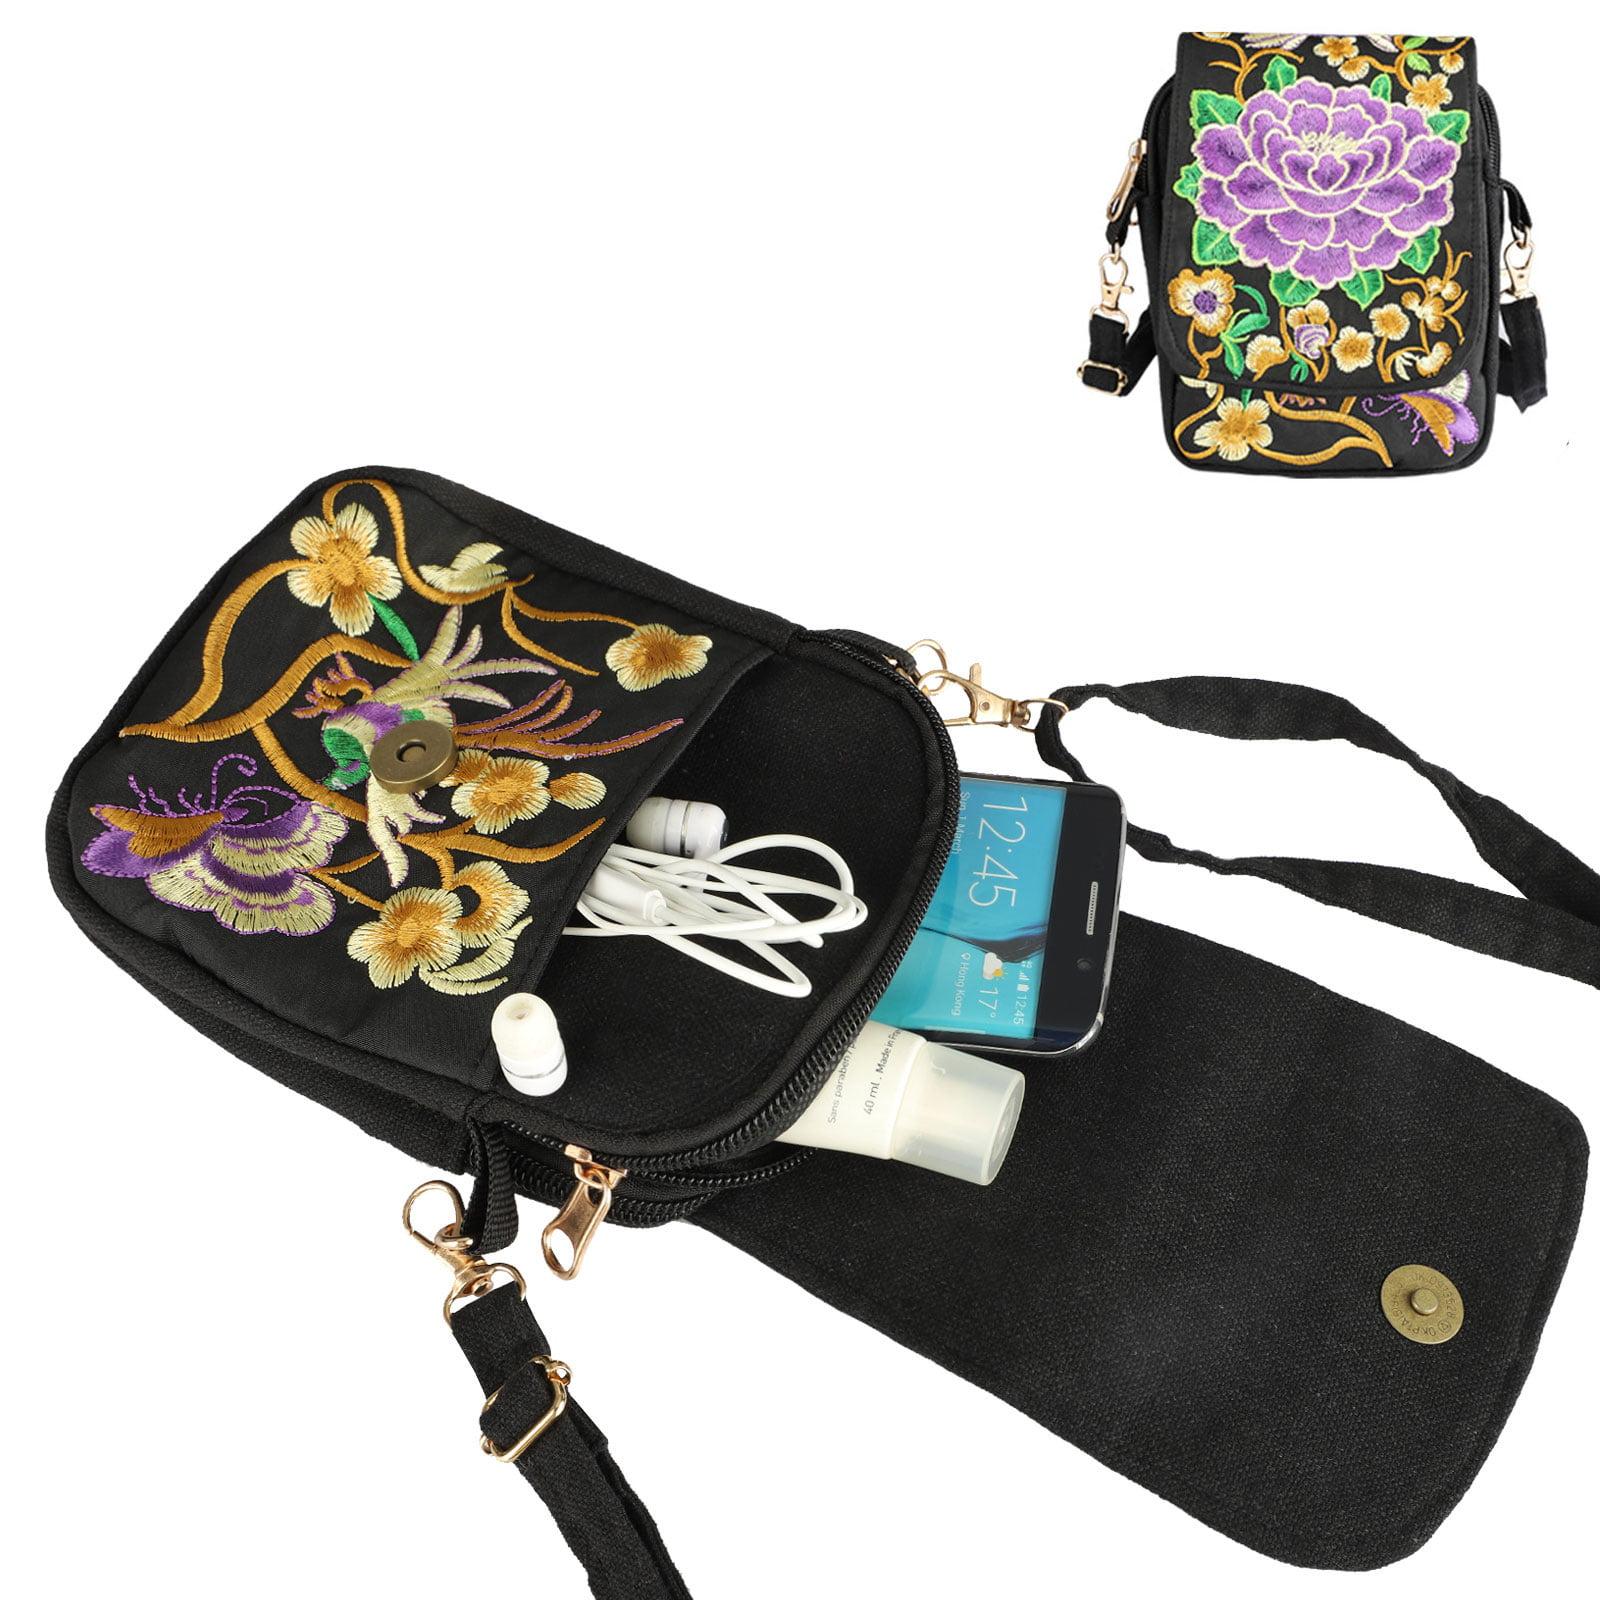 Minni Bag Cell Phone Bag Purse Mini Crossbody Wristlet Handbag Storage bag